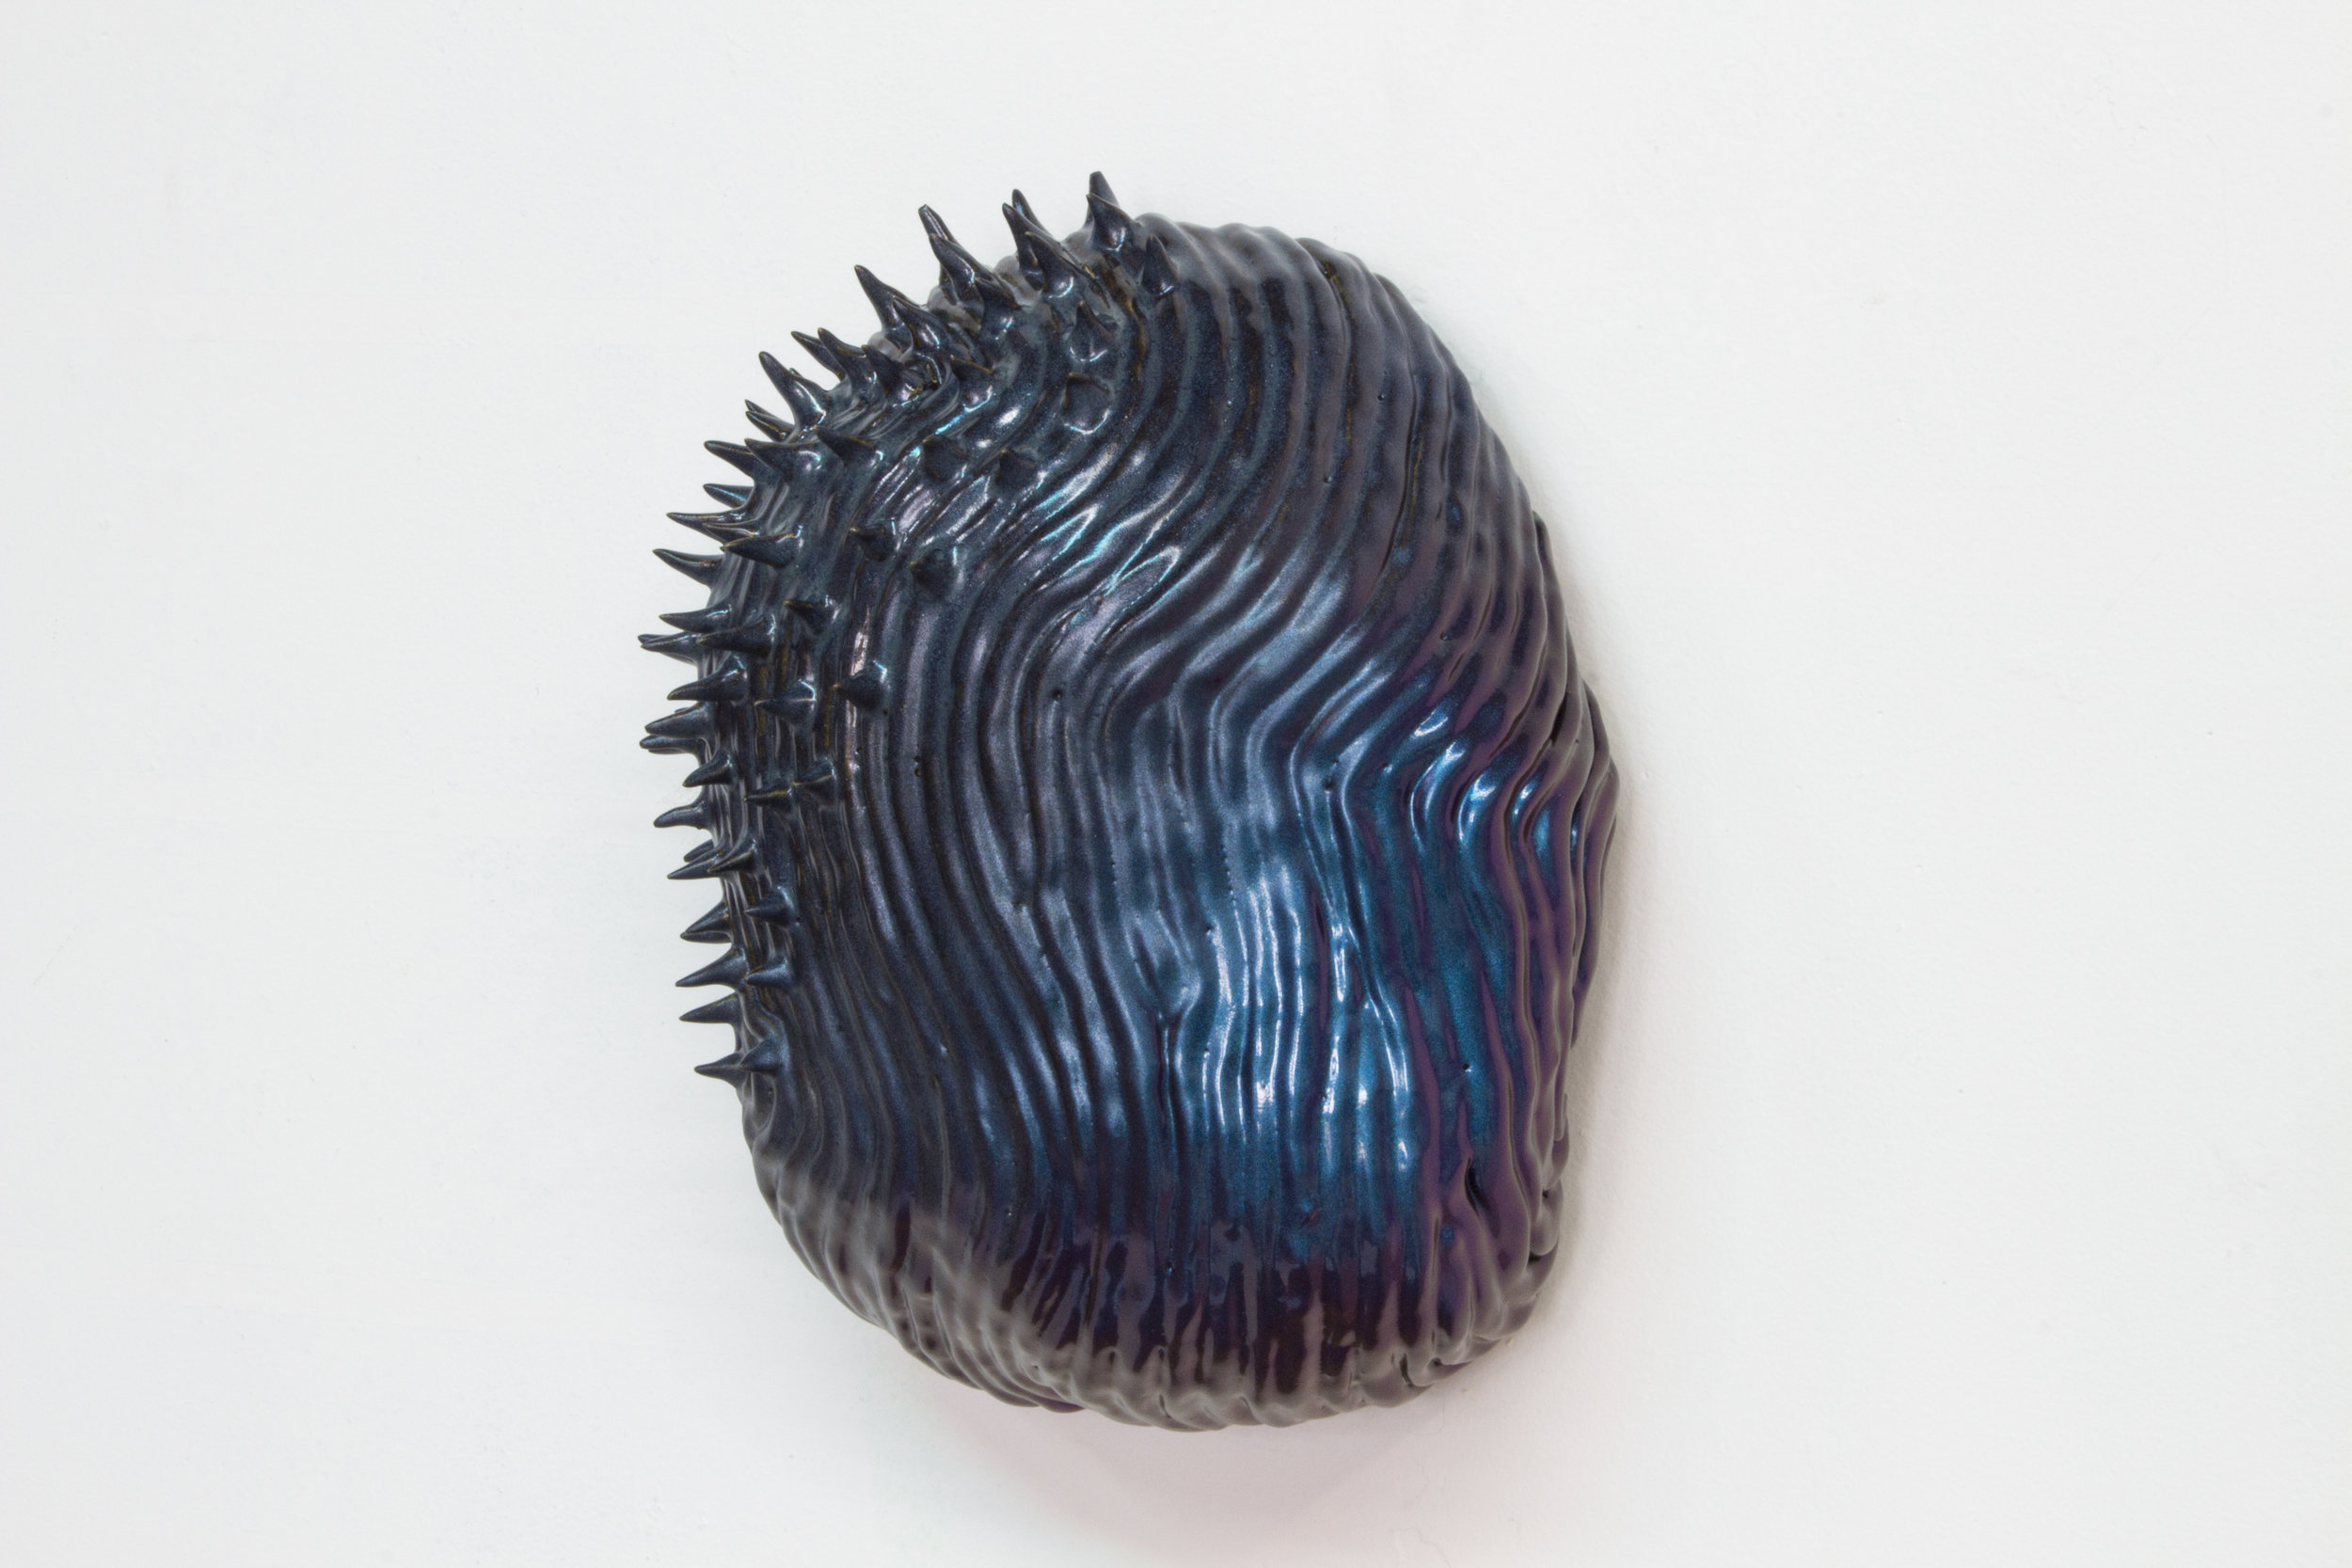 "Philippe Caron Lefebvre,  Classic shiny-shiny,  2017, ceramic, glaze and paint, 5"" x 11"" x 8"" (12 x 28 x 21 cm)"